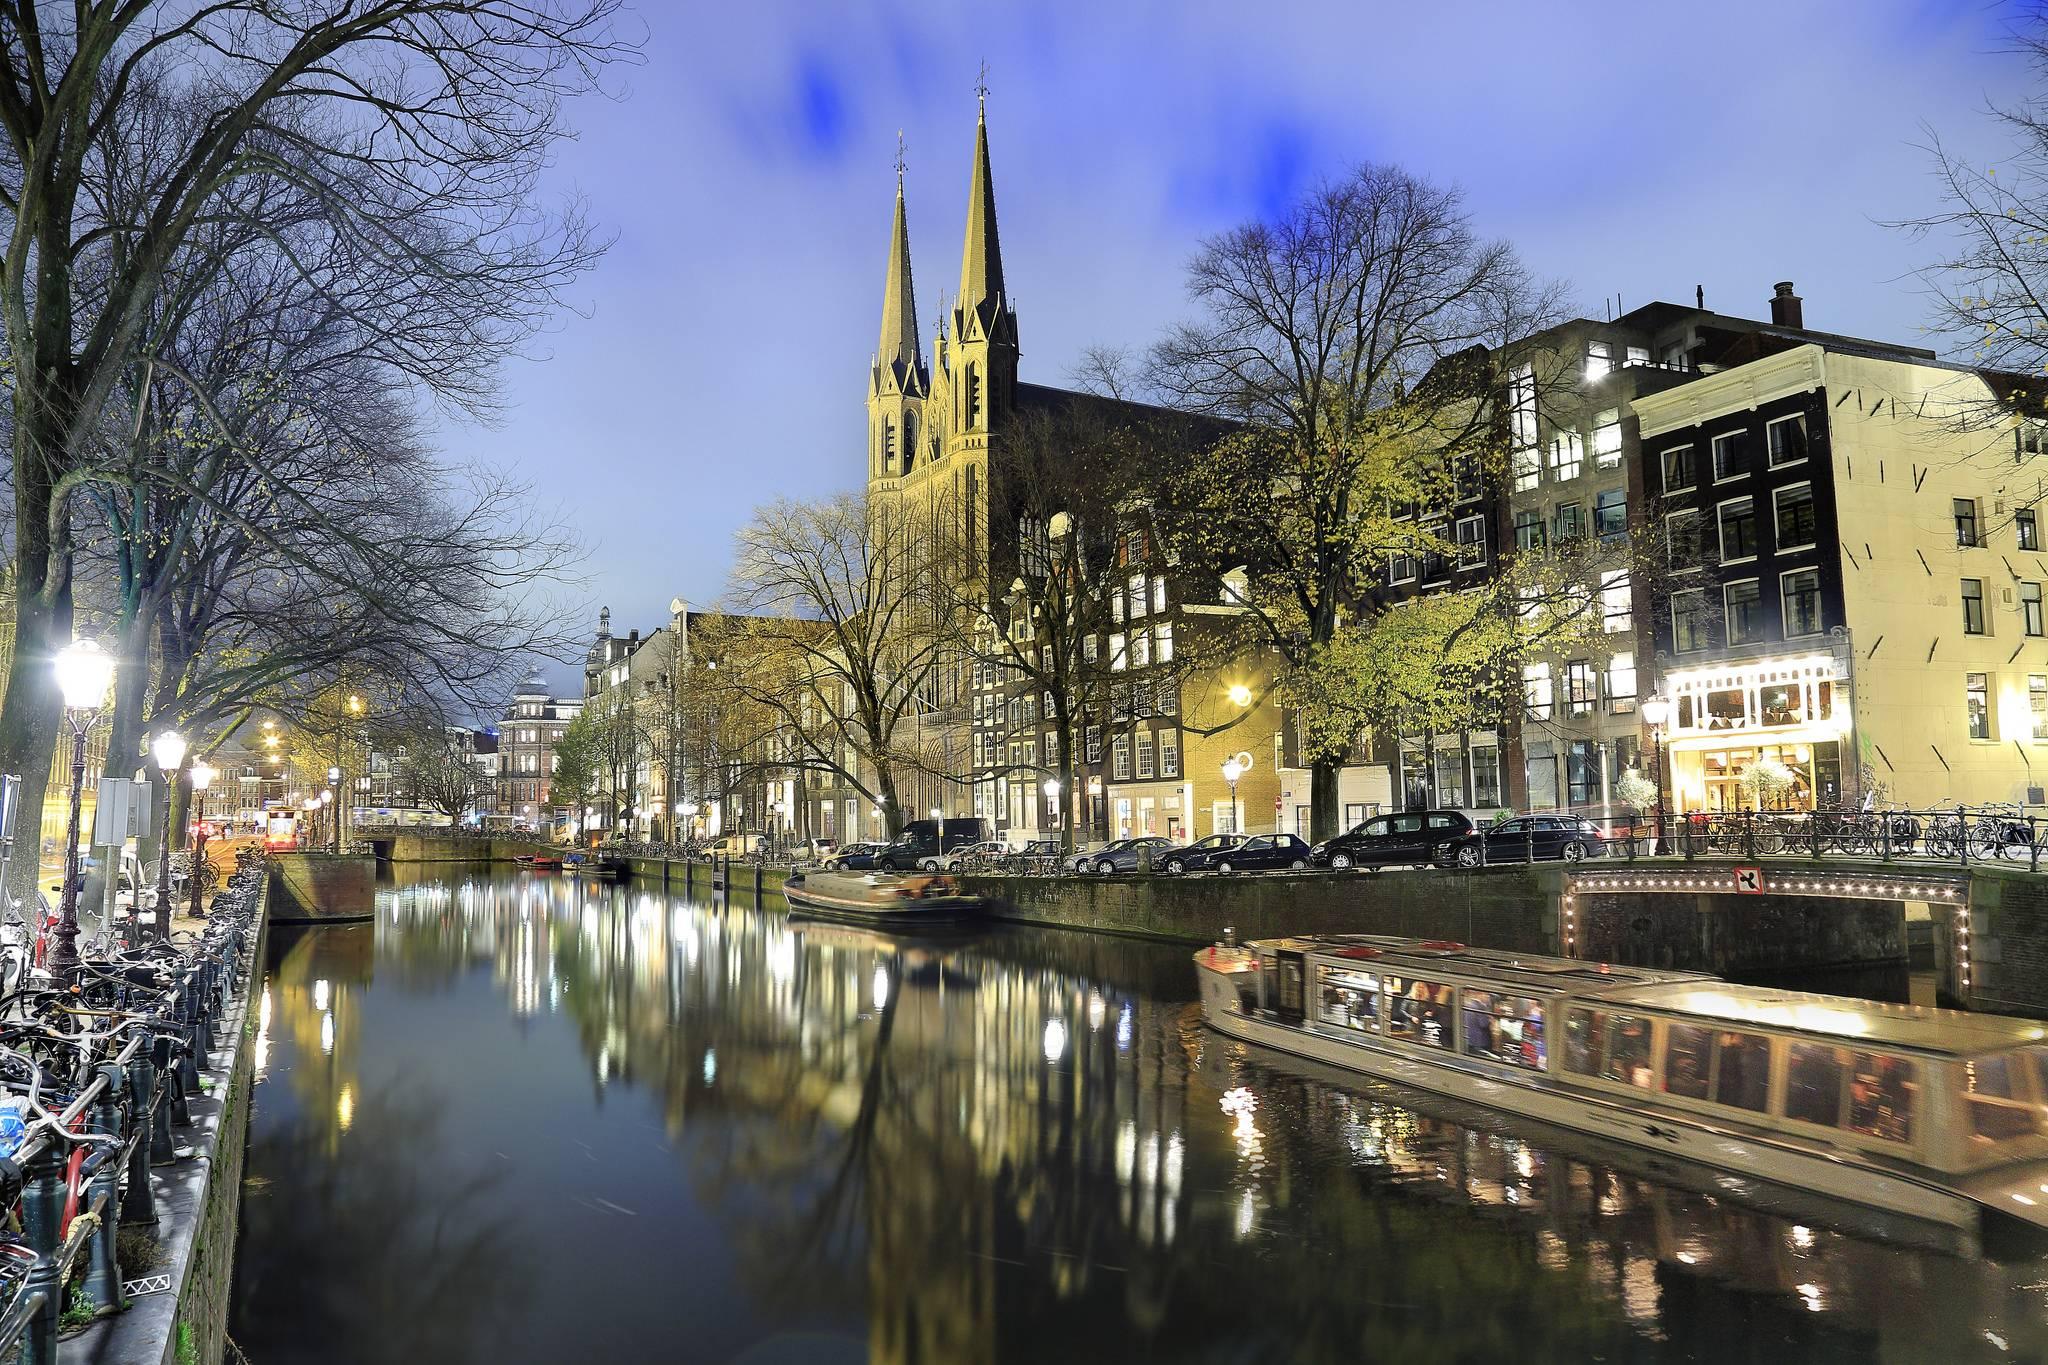 Amsterdam, Амстердам, столица и крупнейший город Нидерландов